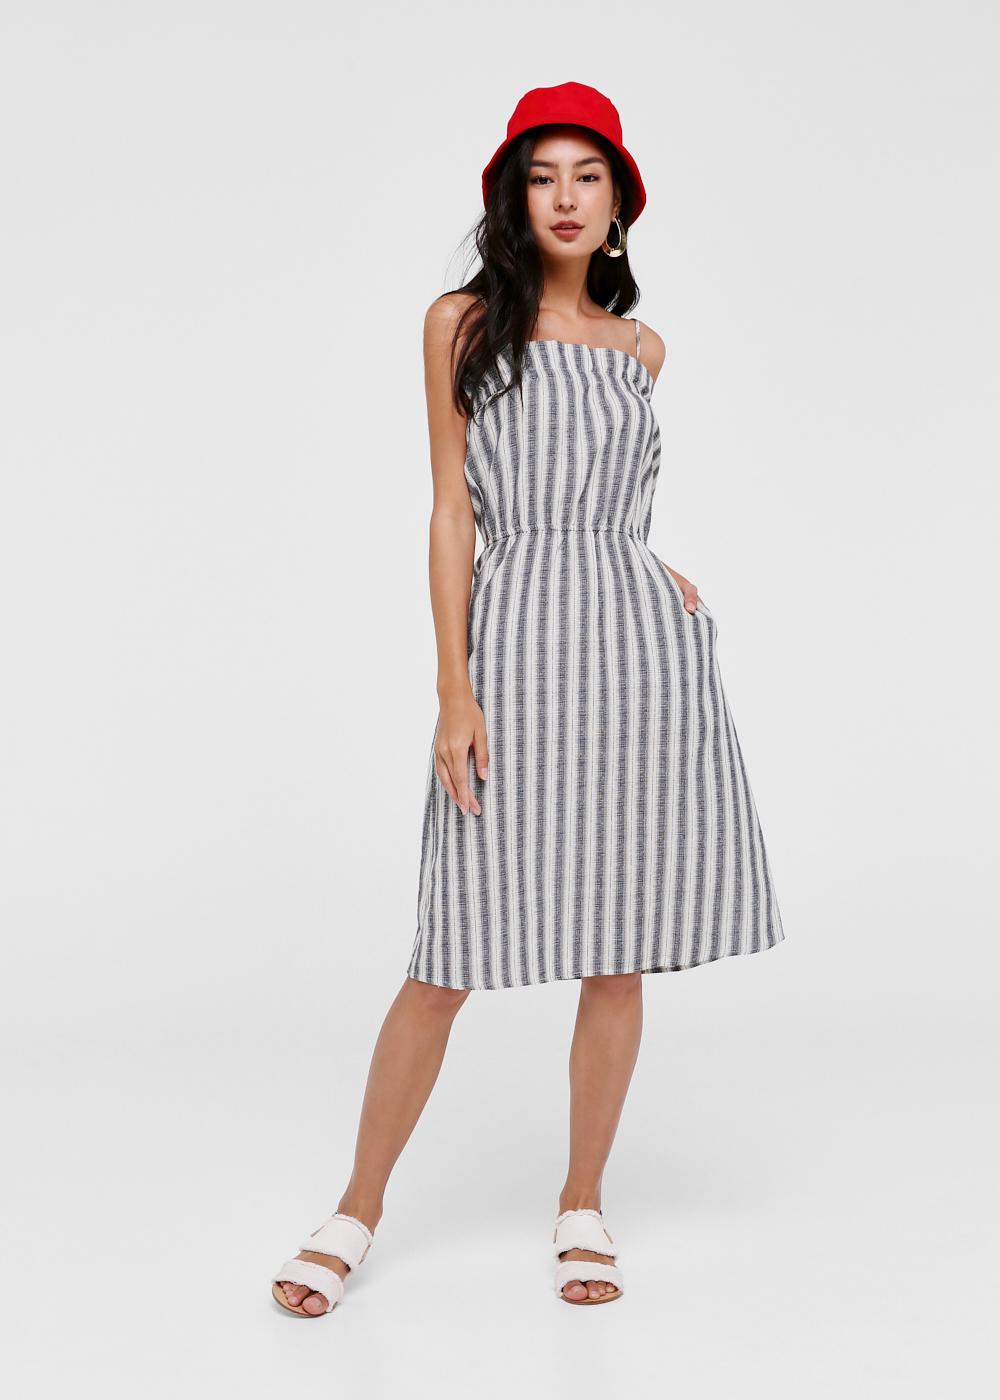 Liesa Striped Beach Dress